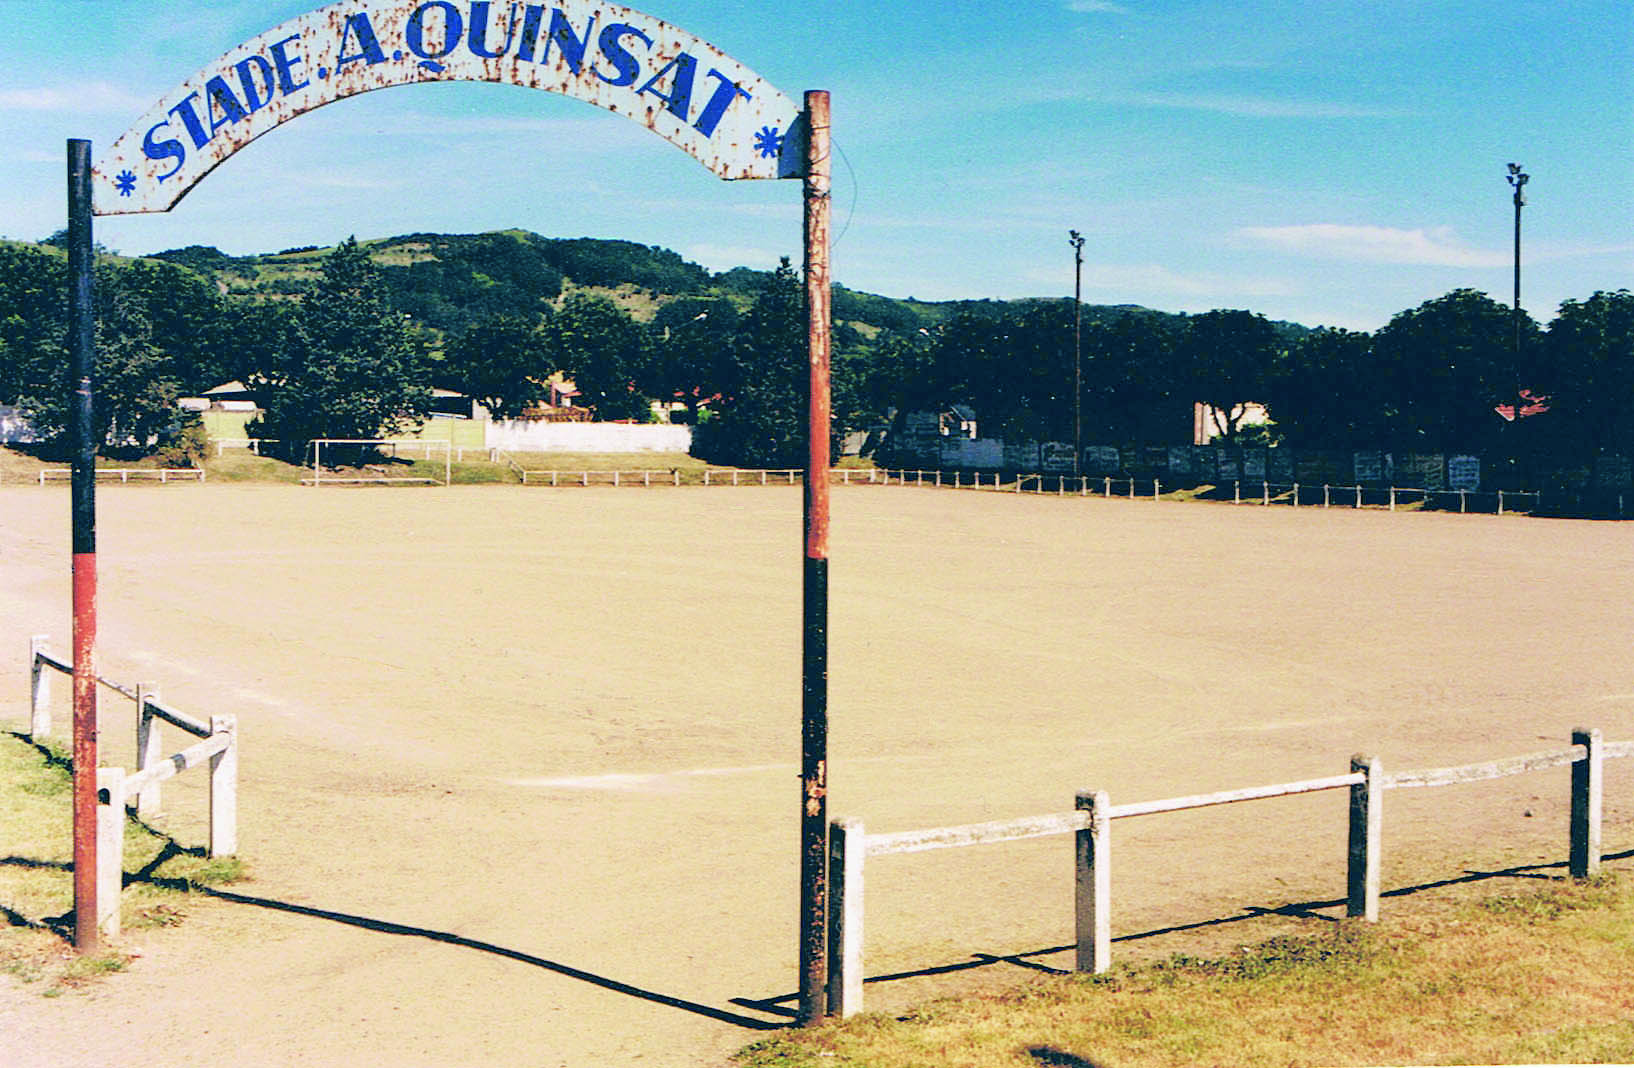 Stade Alphonse-Quinsat